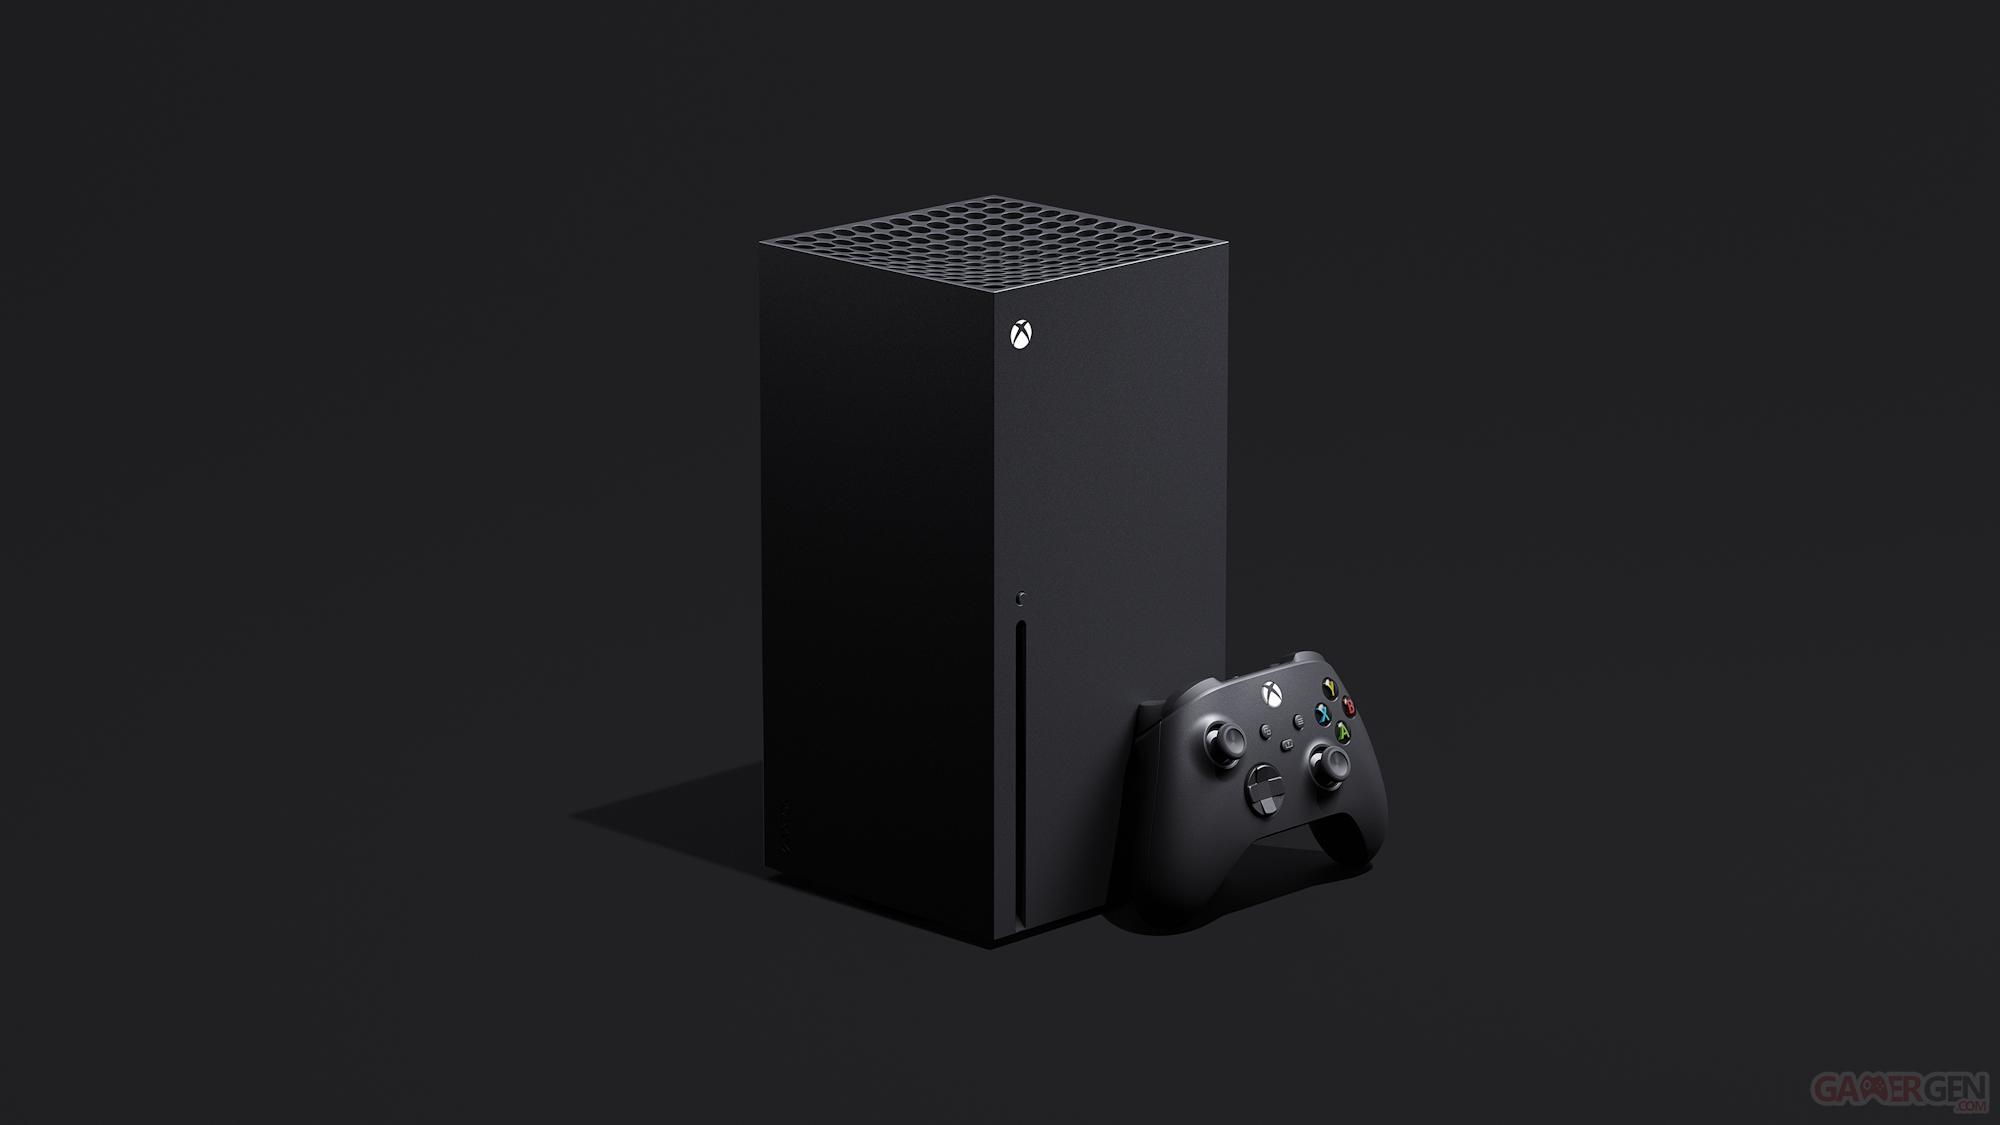 La Xbox Series S (Lockhart) officialisée en août — Microsoft